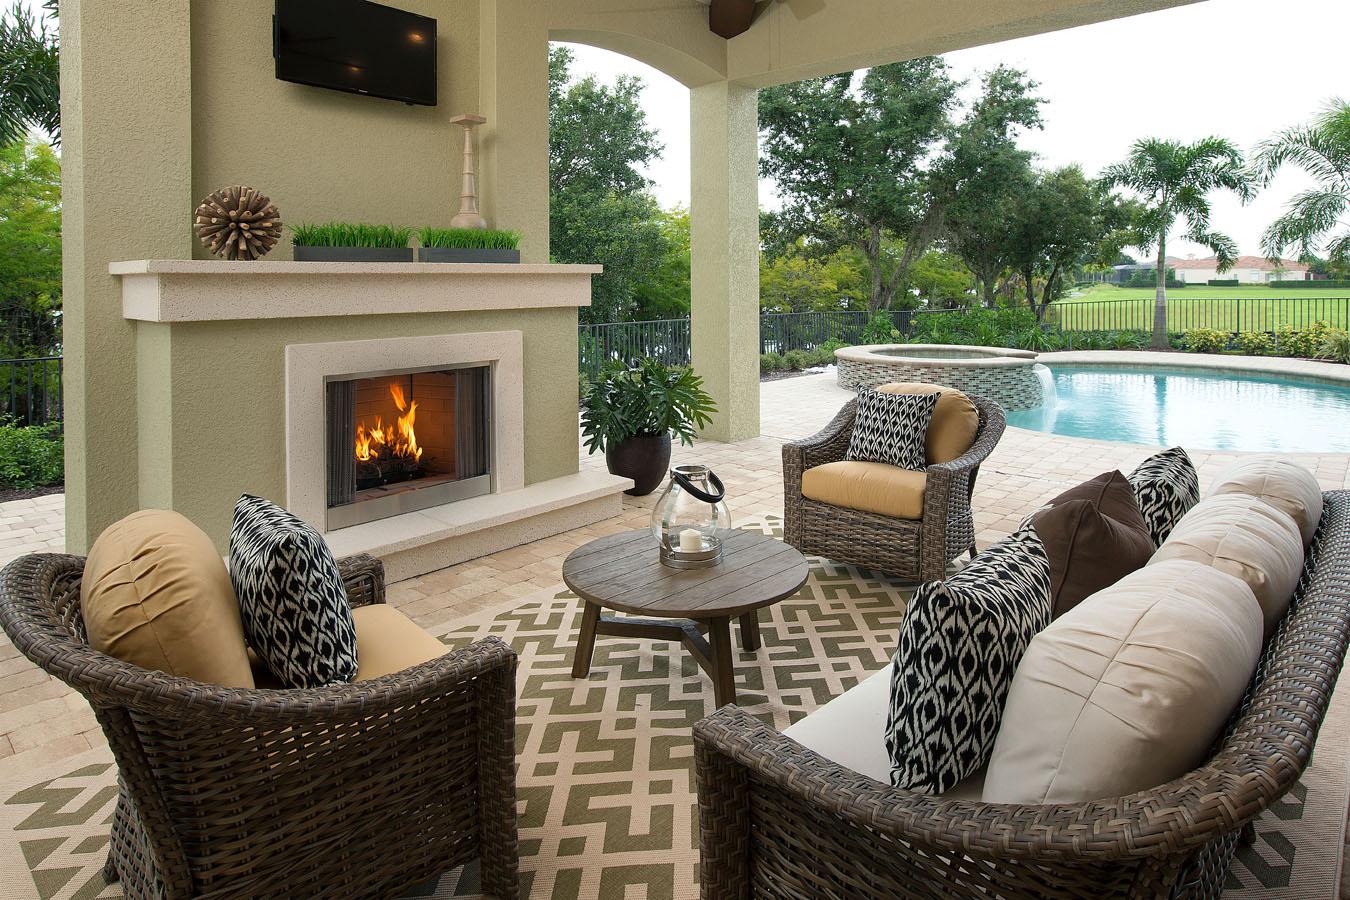 Beasley henley interior design unveils interior design Outdoor room with fireplace